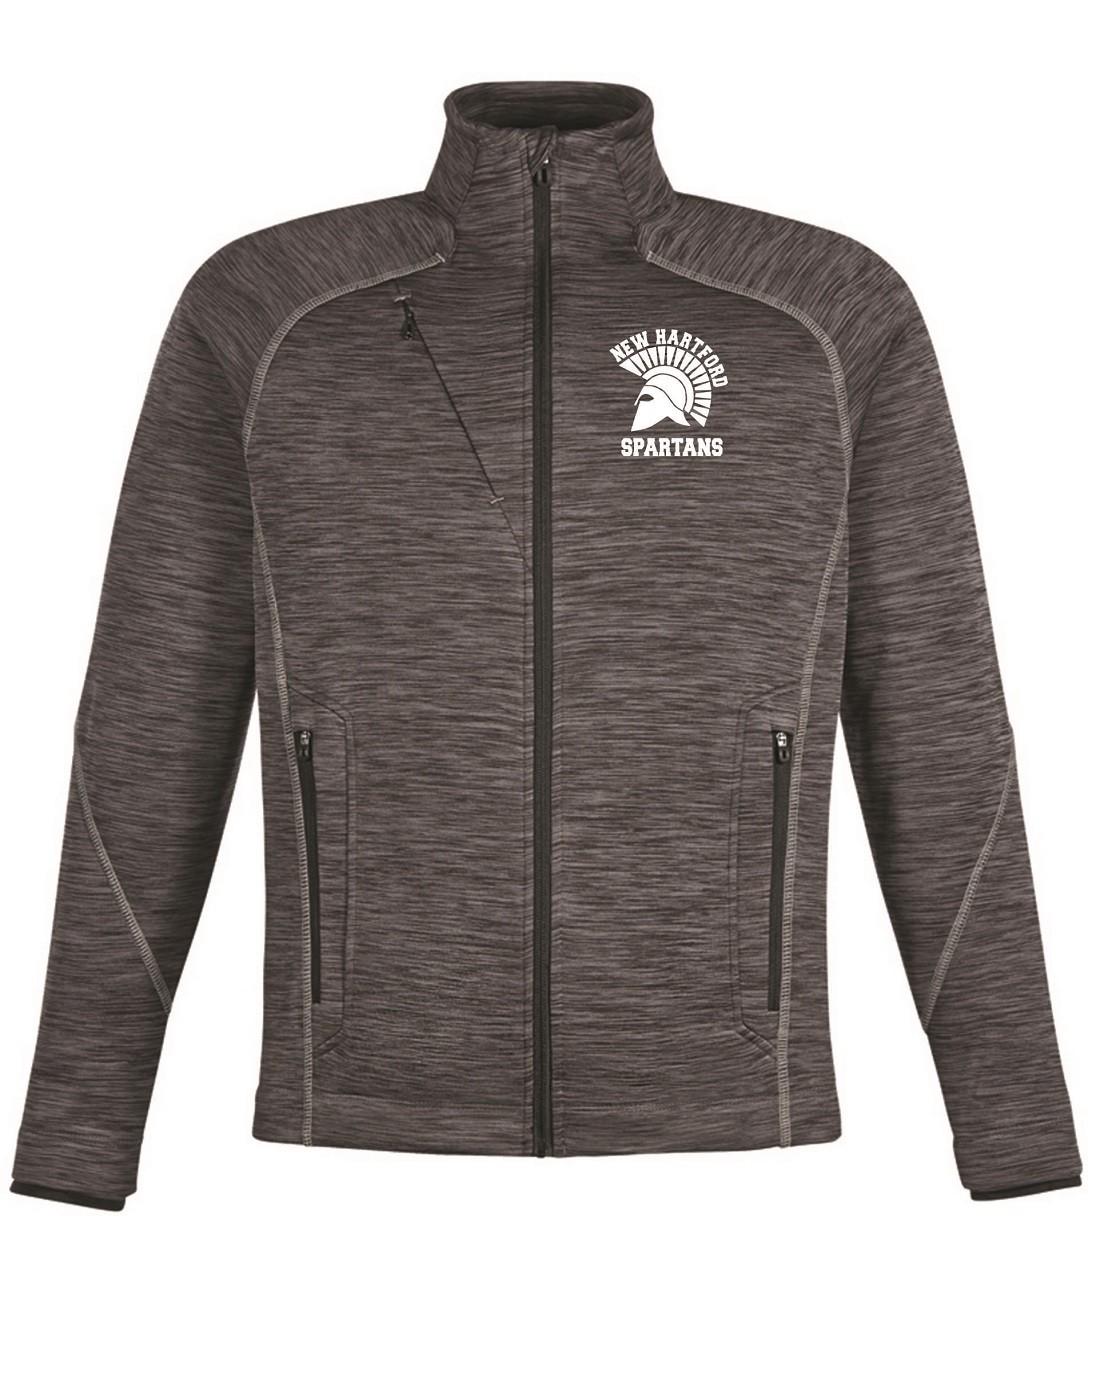 New Hartford Spartans North End Fleece Jacket